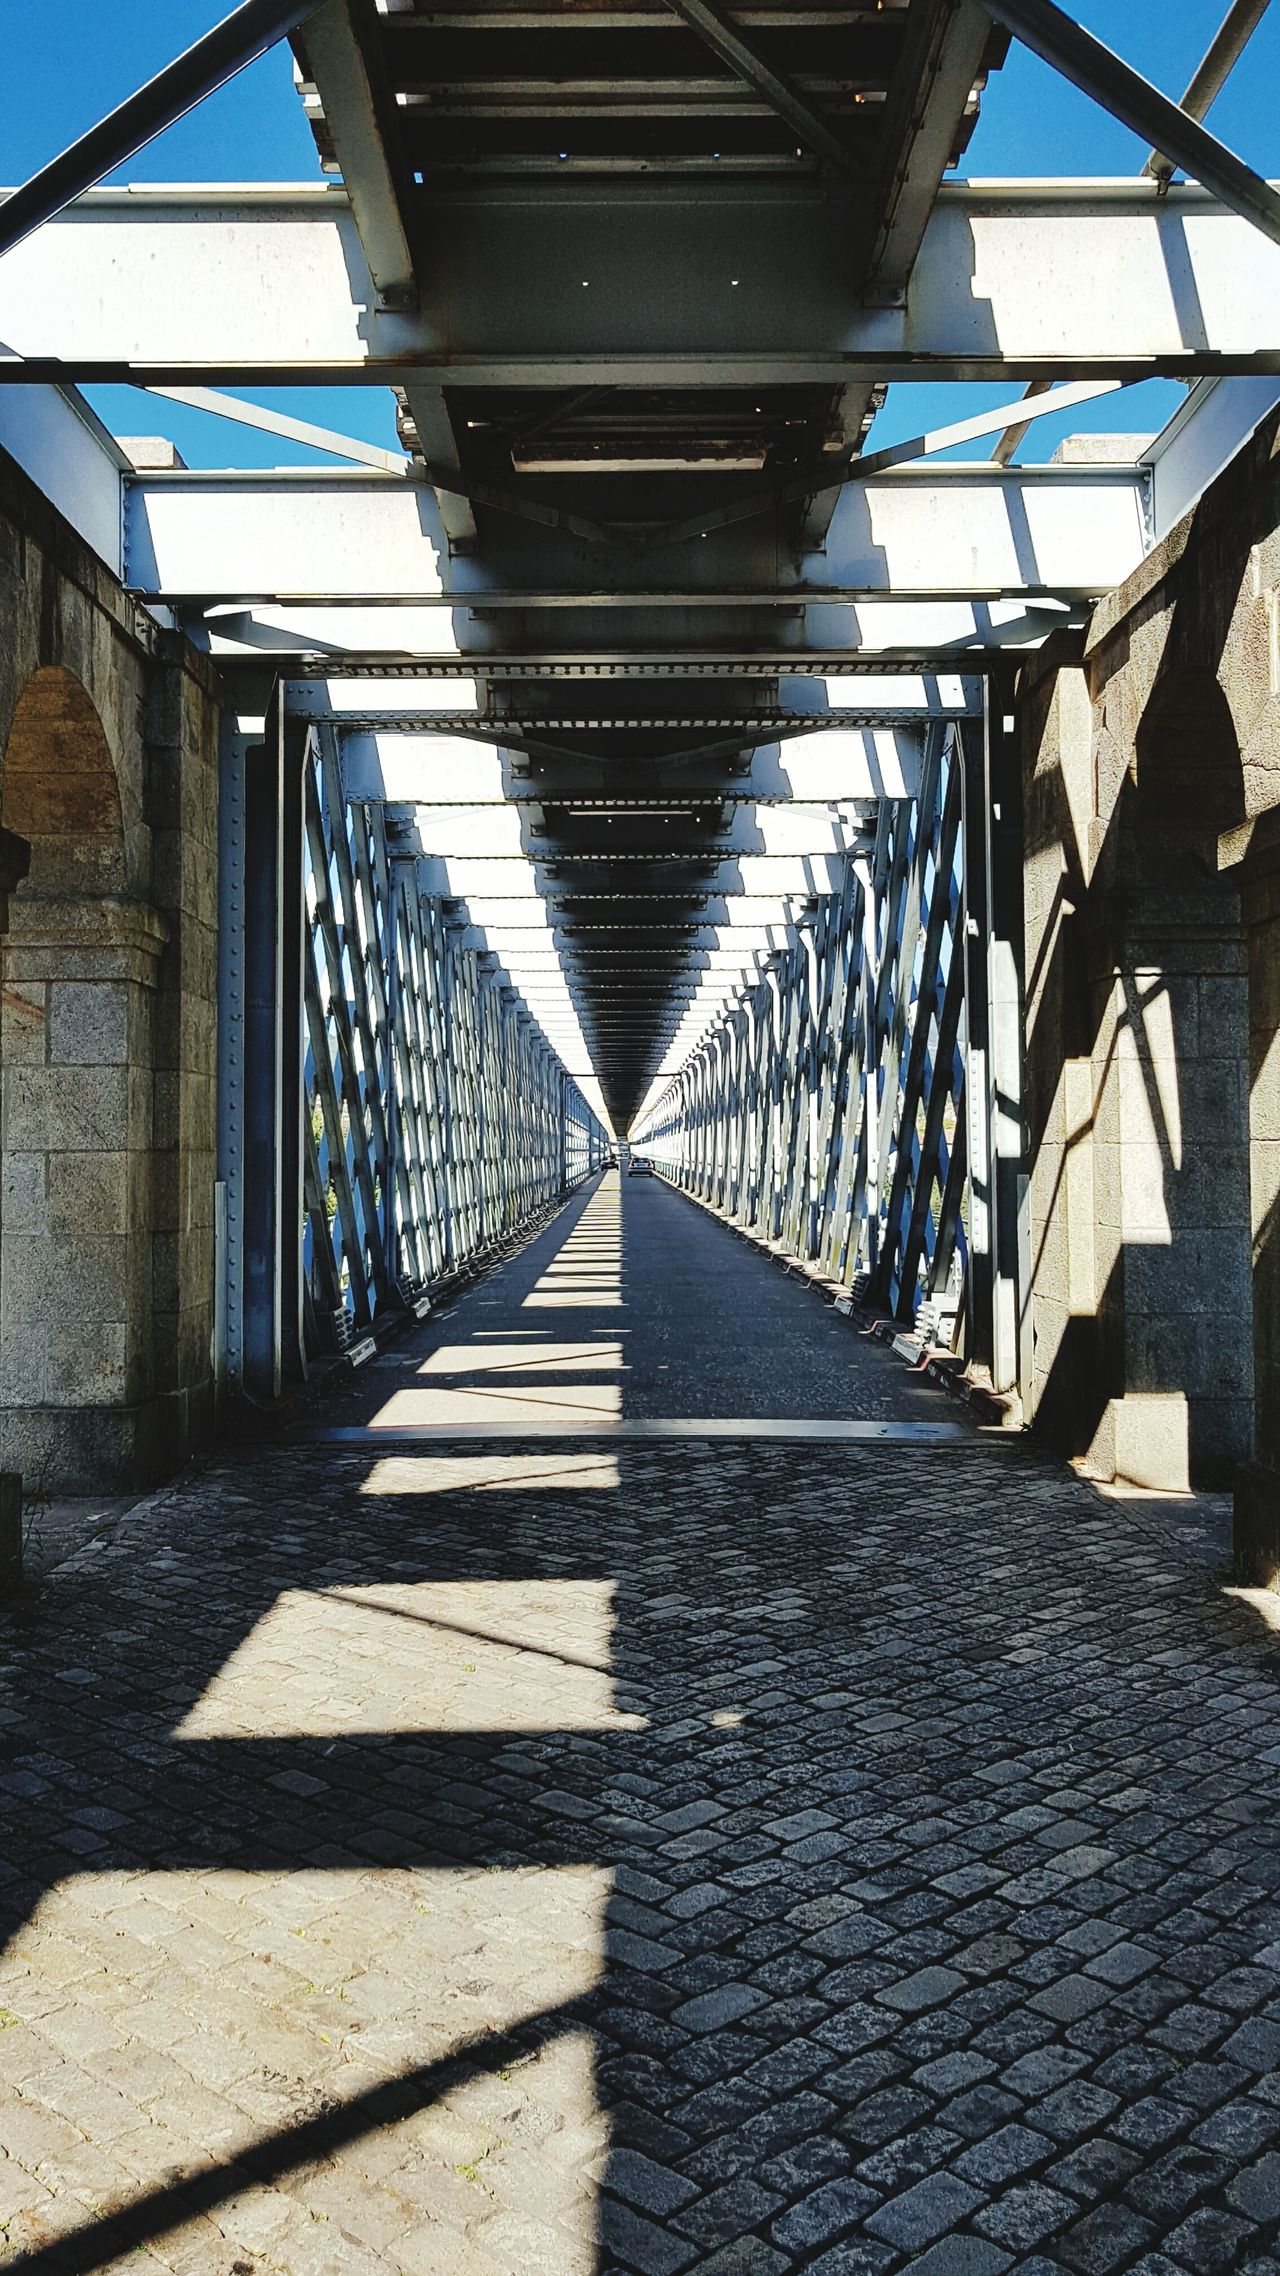 Ponte de Valença Shadow Architecture Bridge - Man Made Structure Day Diminishing Perspective Bridge The Way Forward